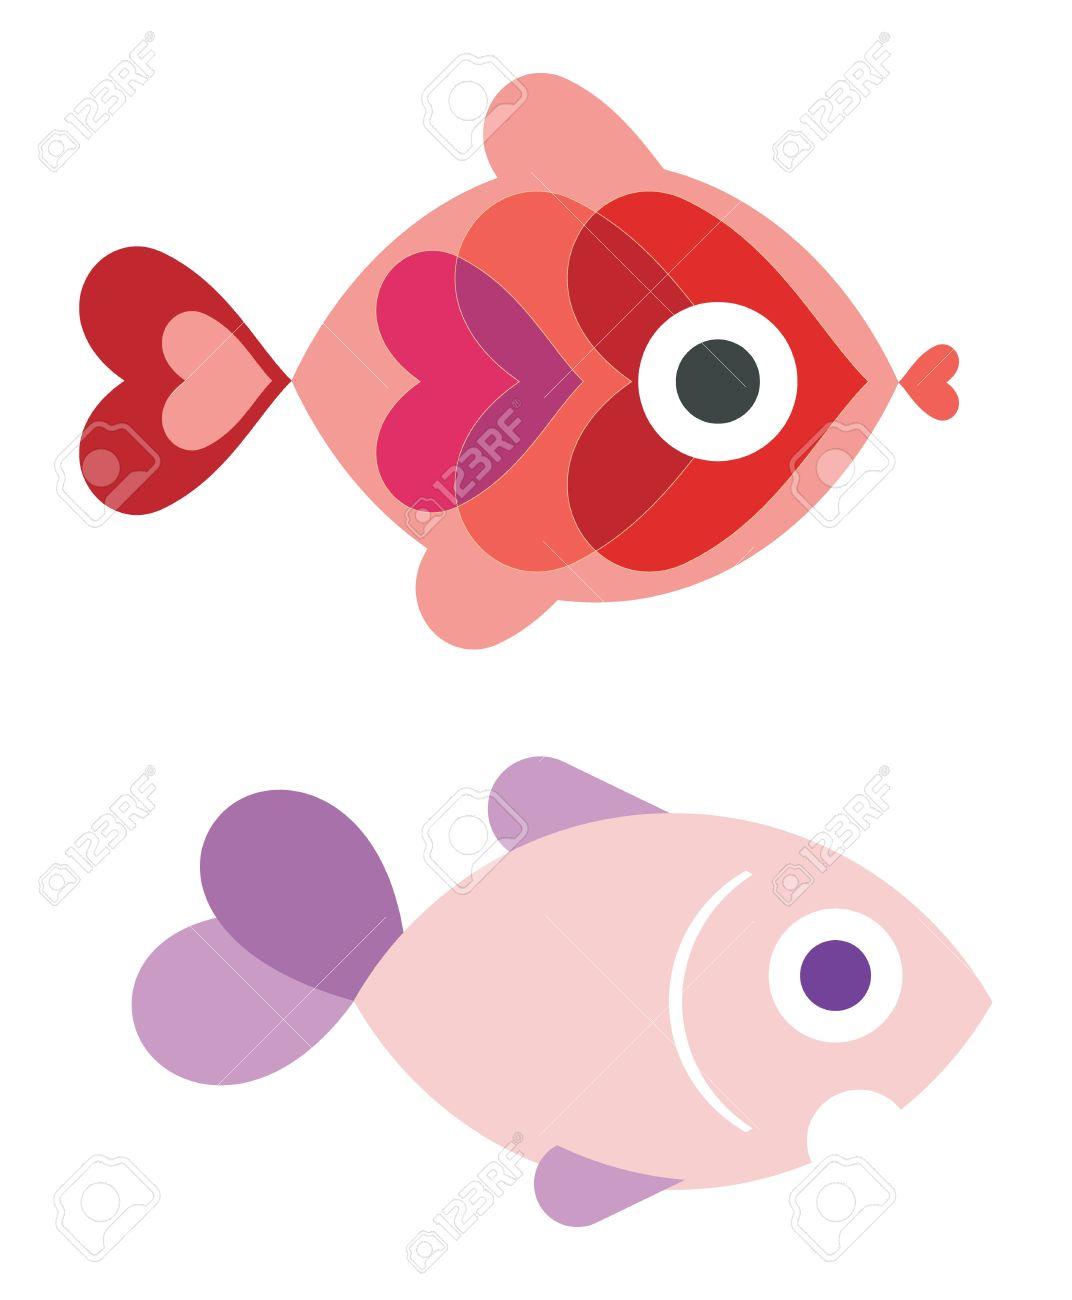 Ornamental Fish Royalty Free Cliparts, Vectors, And Stock.